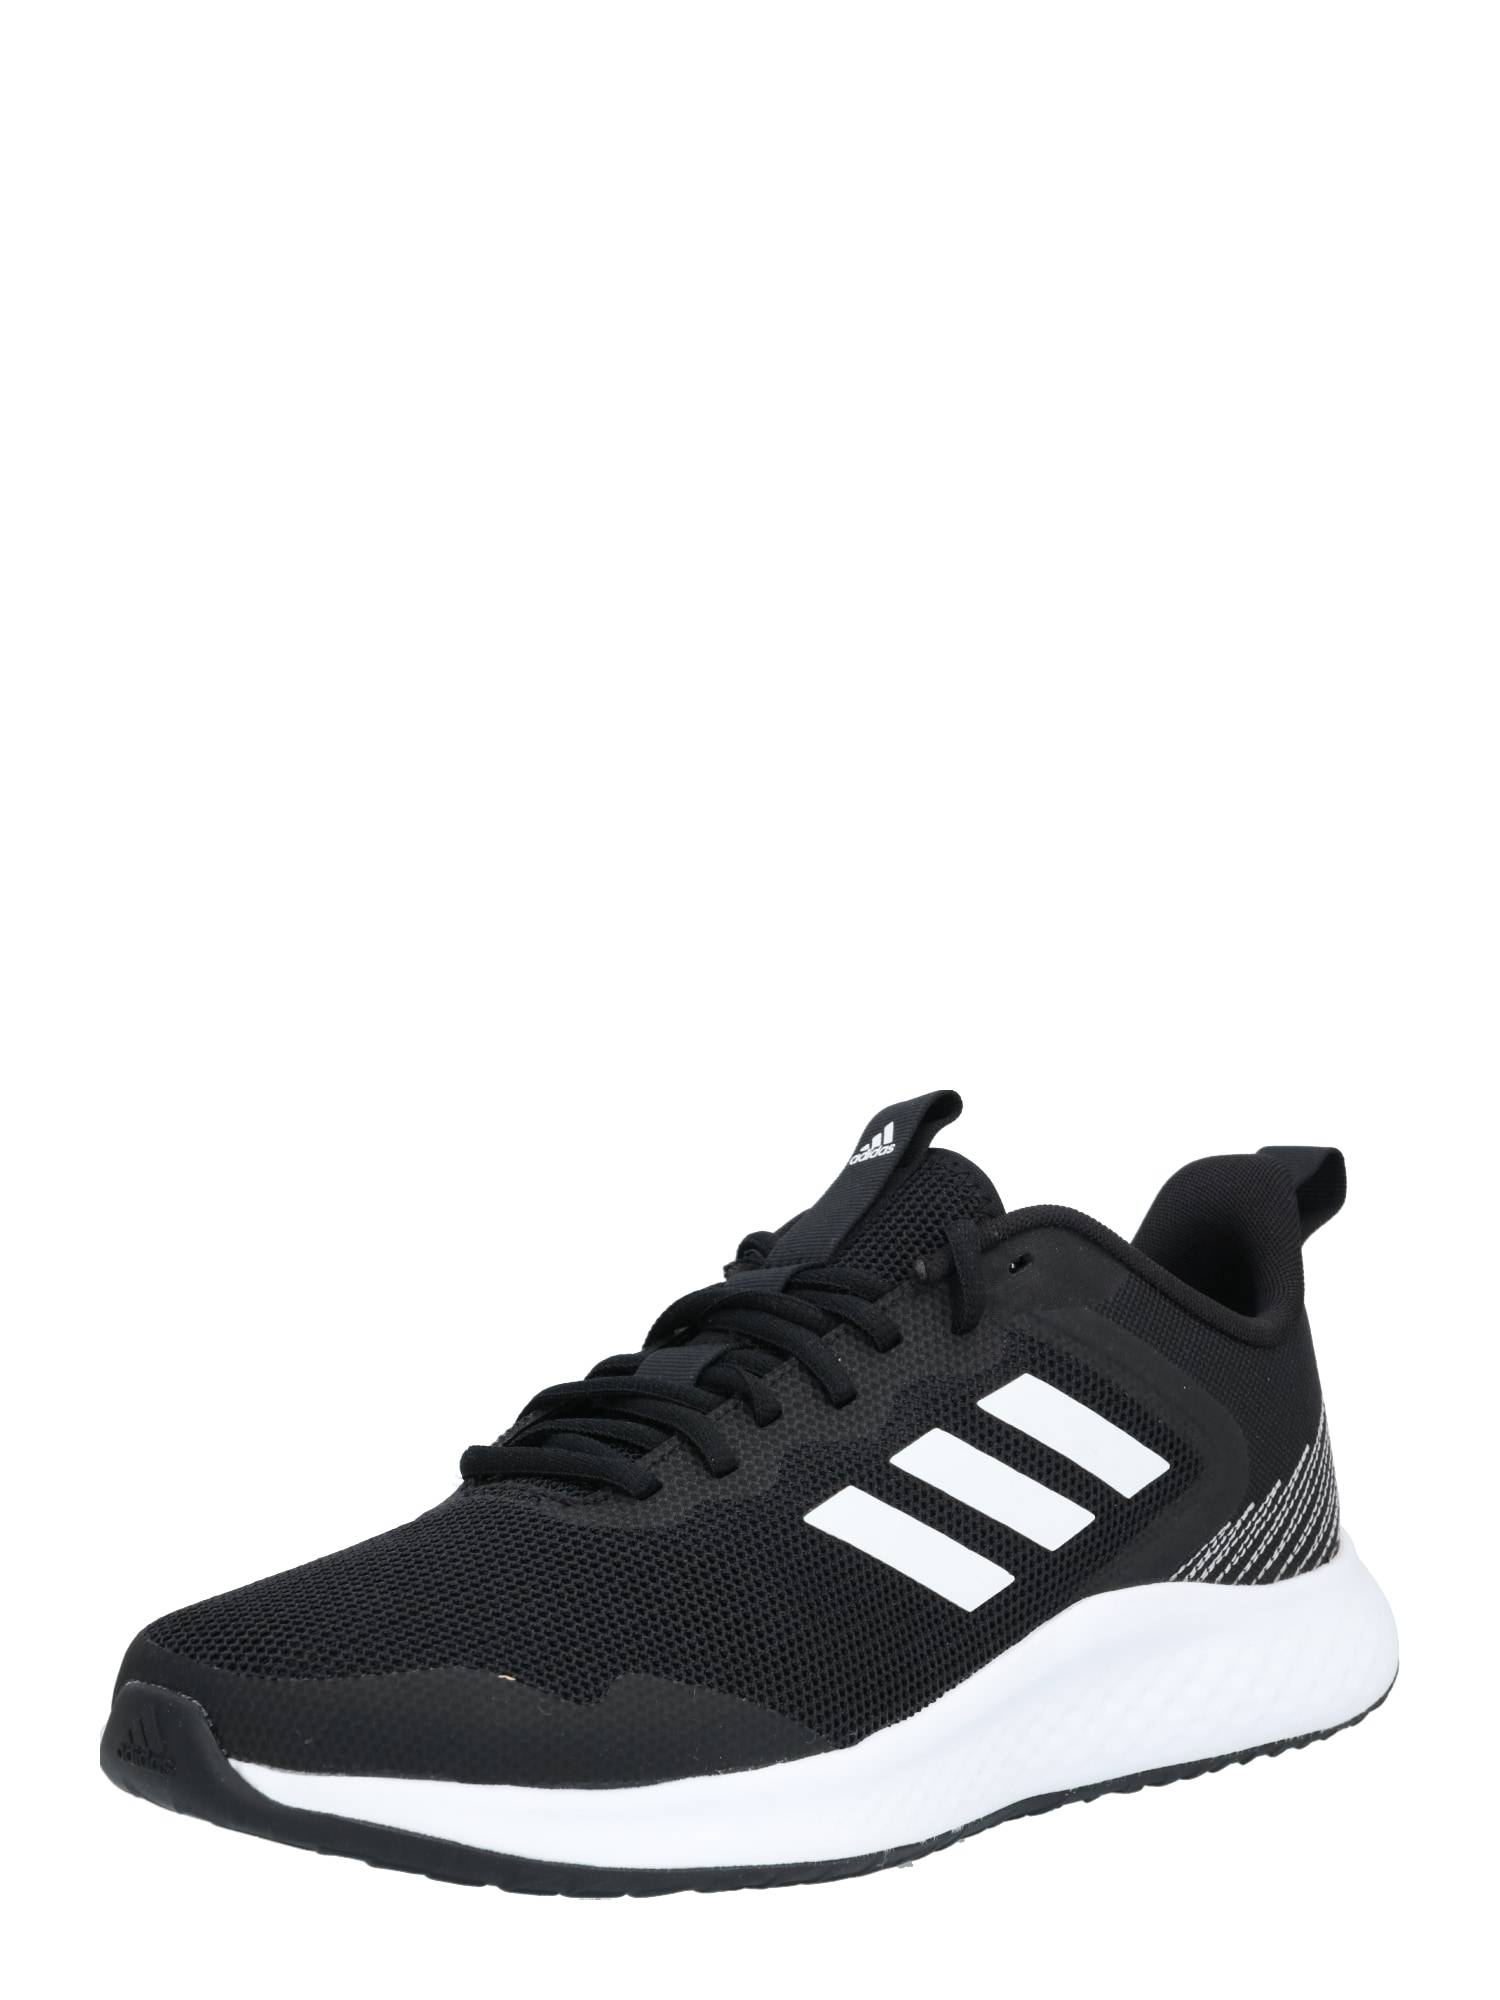 ADIDAS PERFORMANCE Chaussure de course 'Fluid Street'  - Noir - Taille: 11 - male